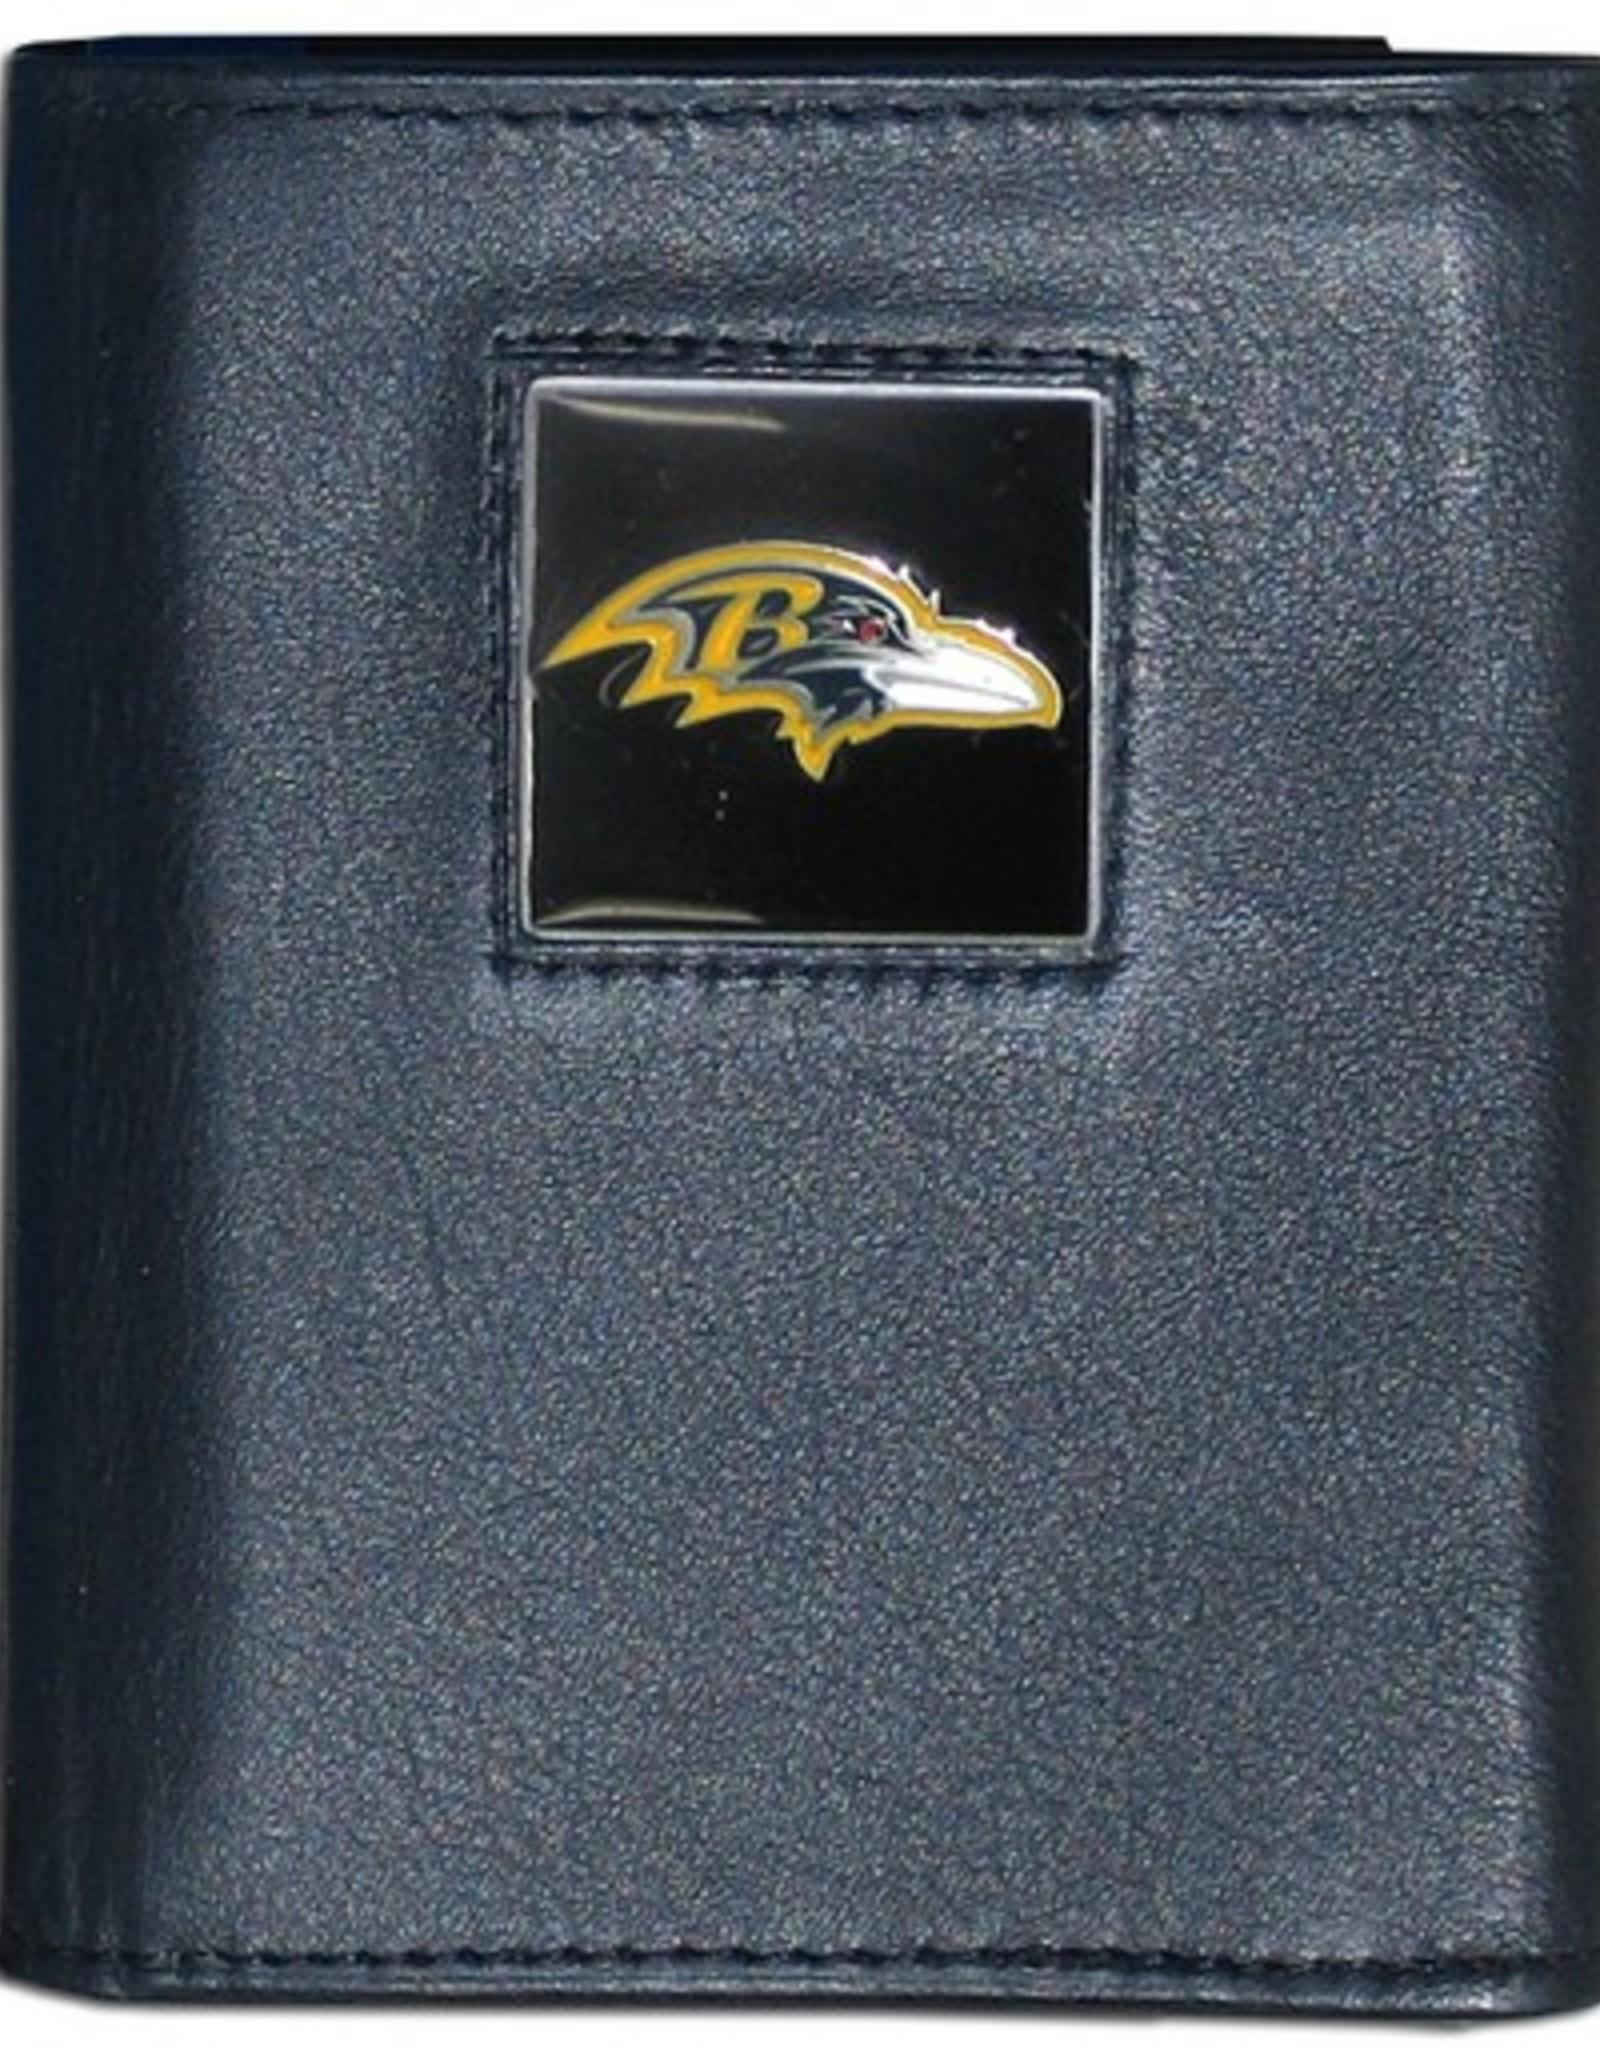 SISKIYOU GIFTS Baltimore Ravens Executive Black Leather Trifold Wallet